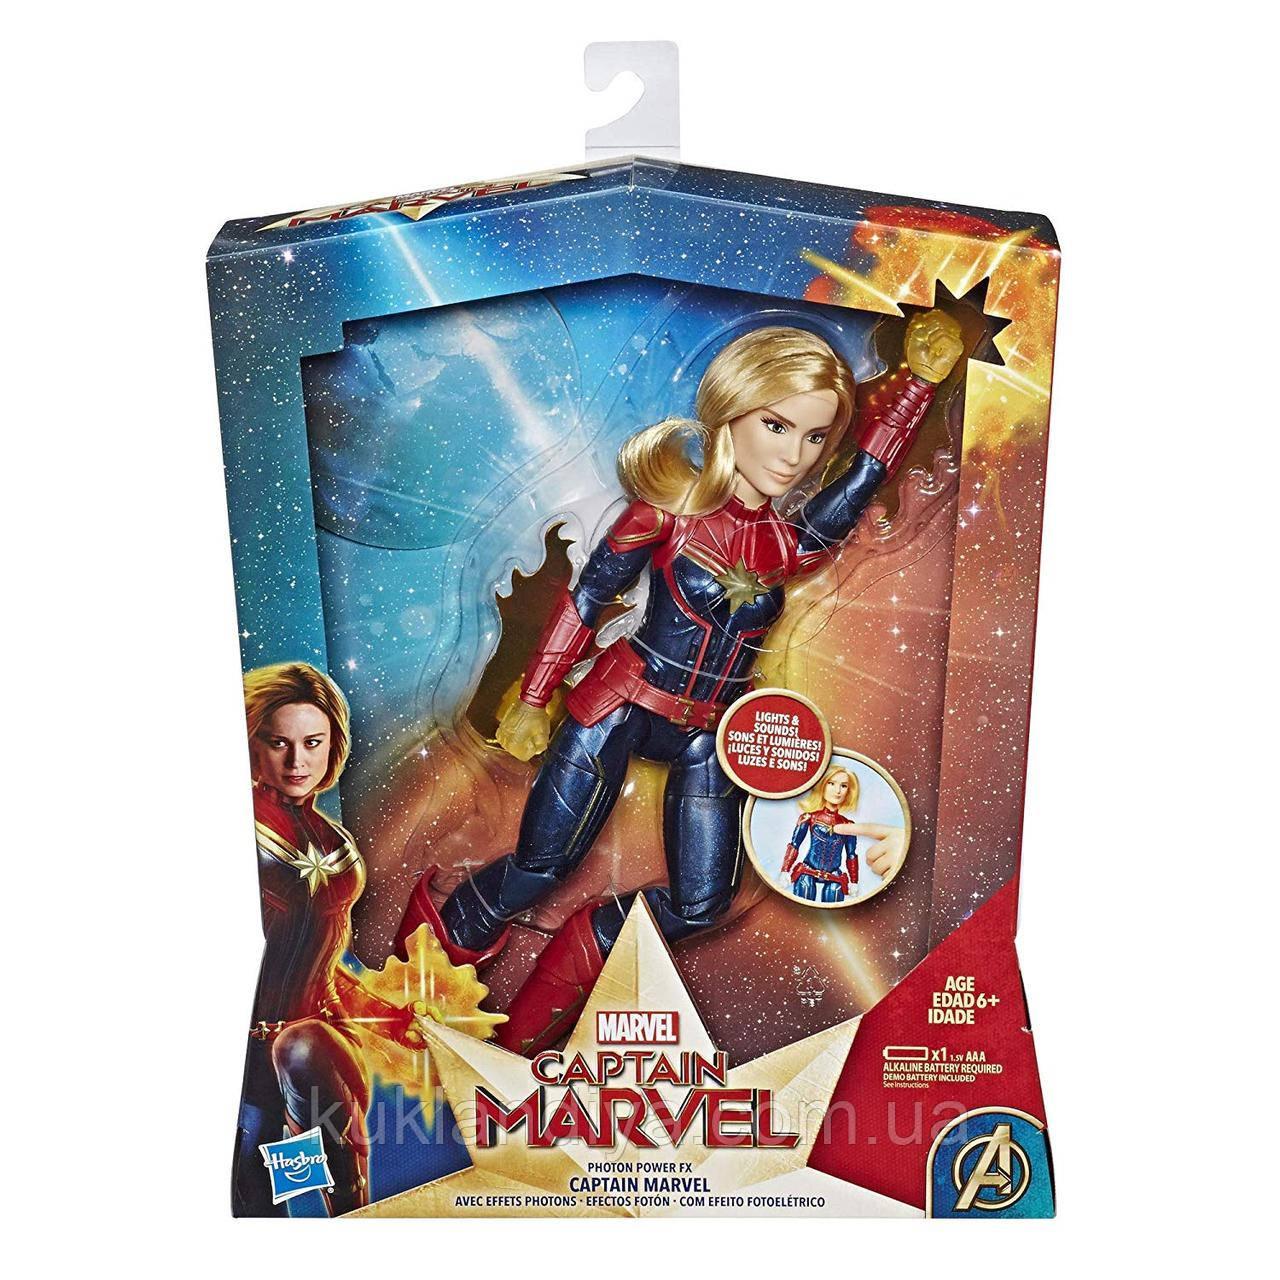 Интерактивная кукла Капитан Марвел Сила фотона - Marvel Captain Marvel Movie Photon Power